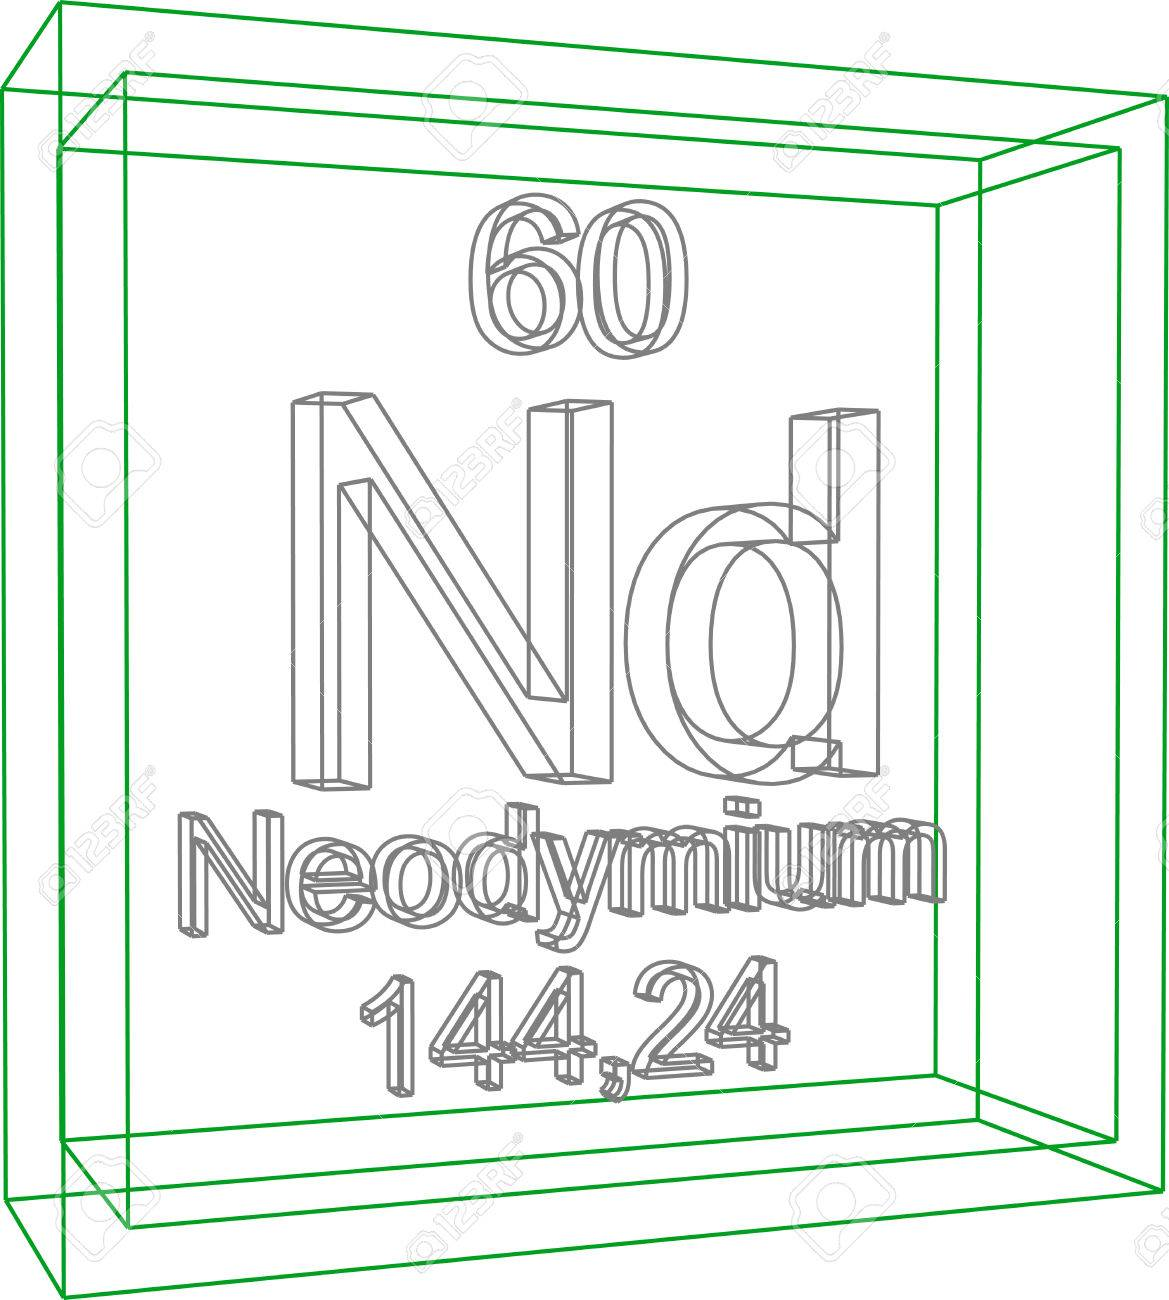 Periodic table of elements neodymium royalty free cliparts periodic table of elements neodymium stock vector 57970888 gamestrikefo Choice Image